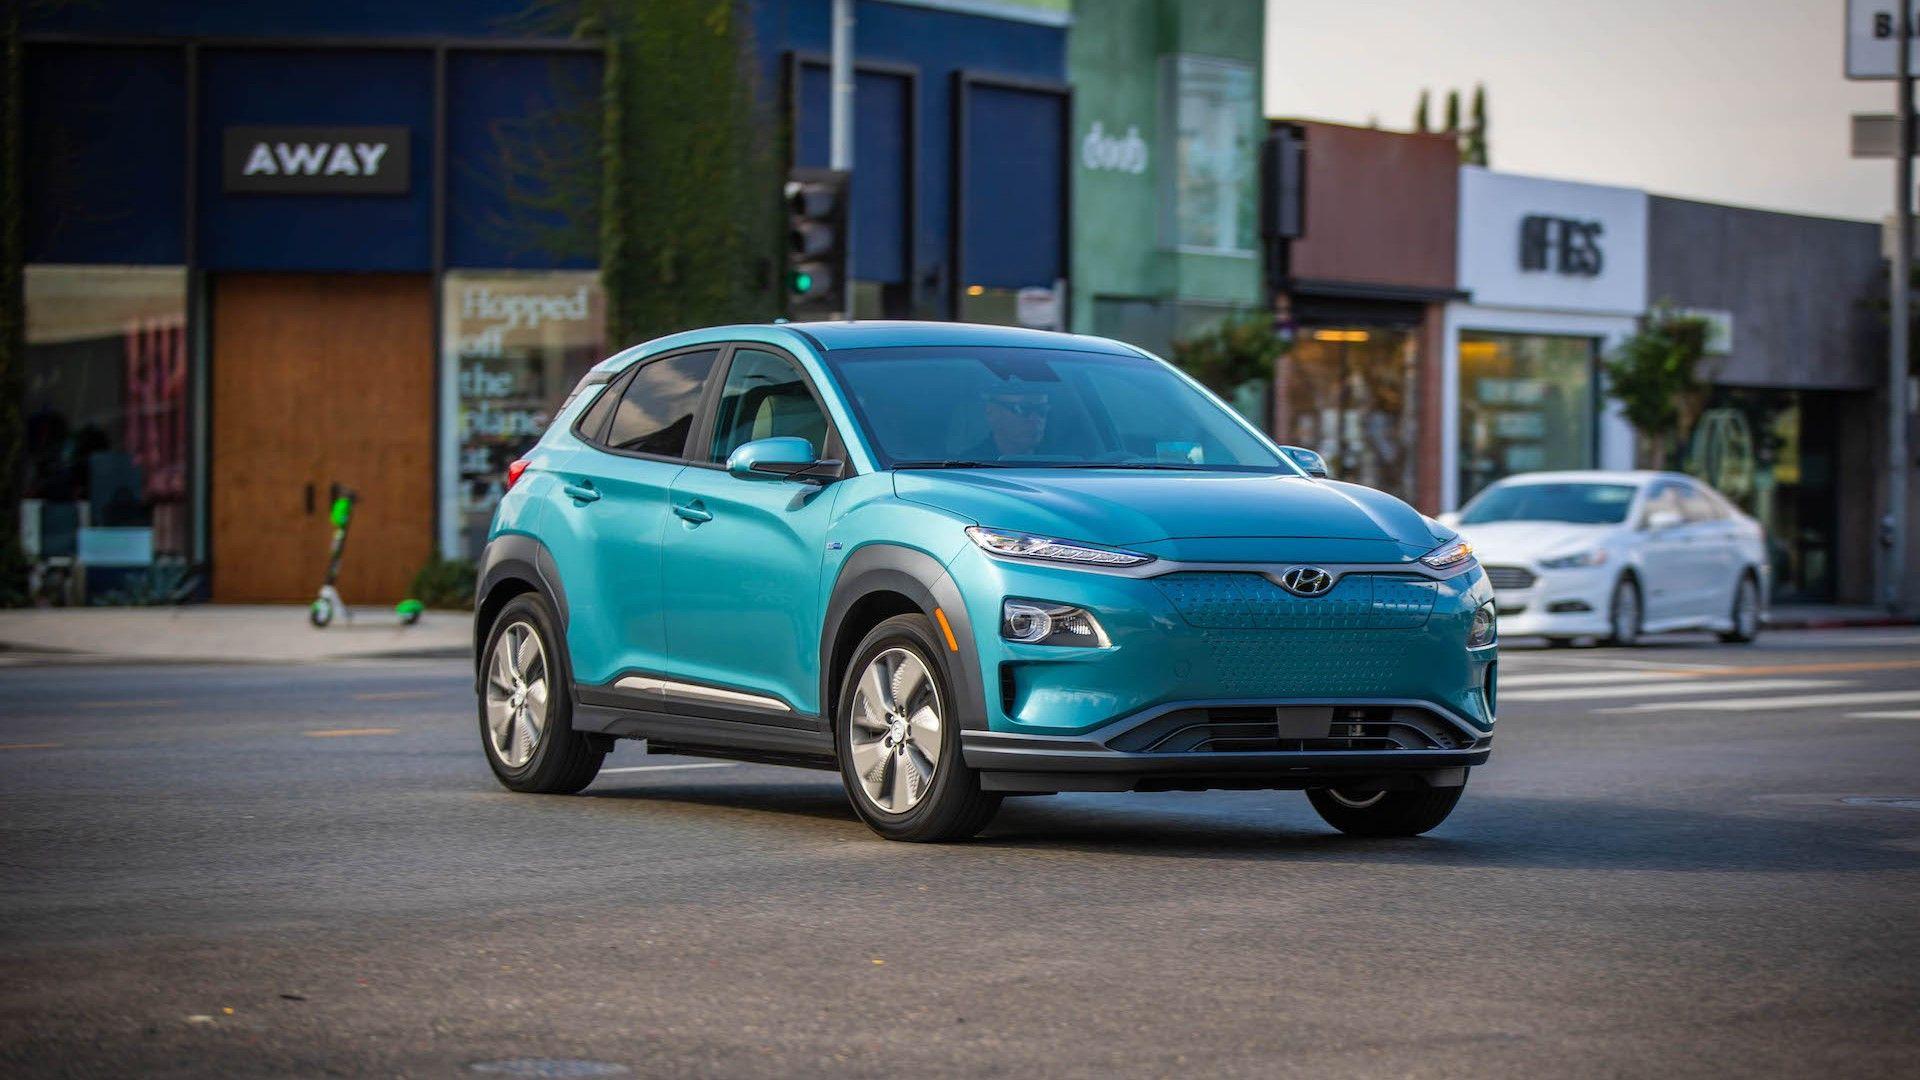 Hyundai Kona Electric 2020 Redesign in 2020 Hyundai, All